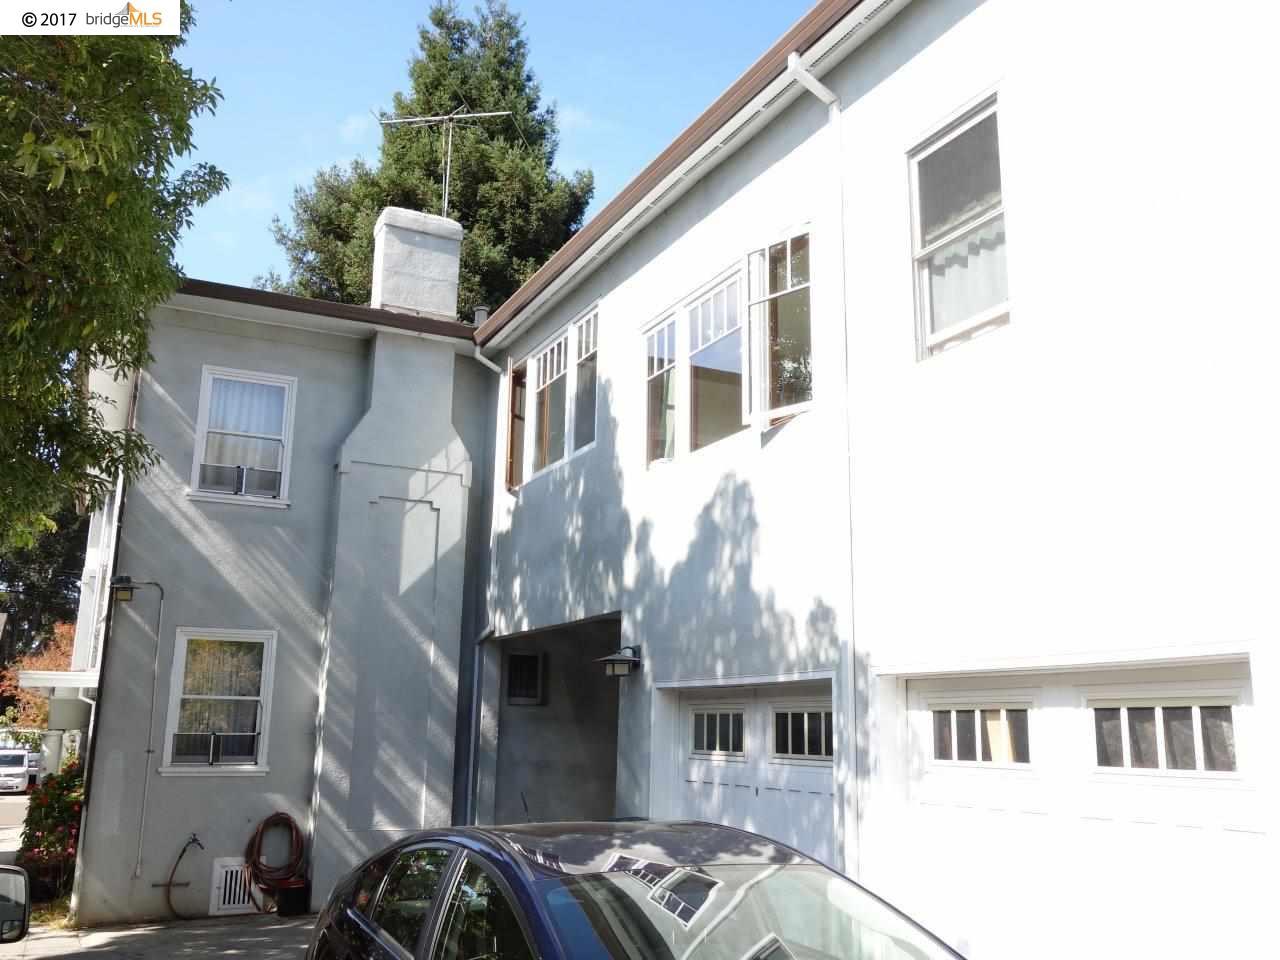 6426 BENVENUE AVENUE #4, OAKLAND, CA 94618  Photo 6